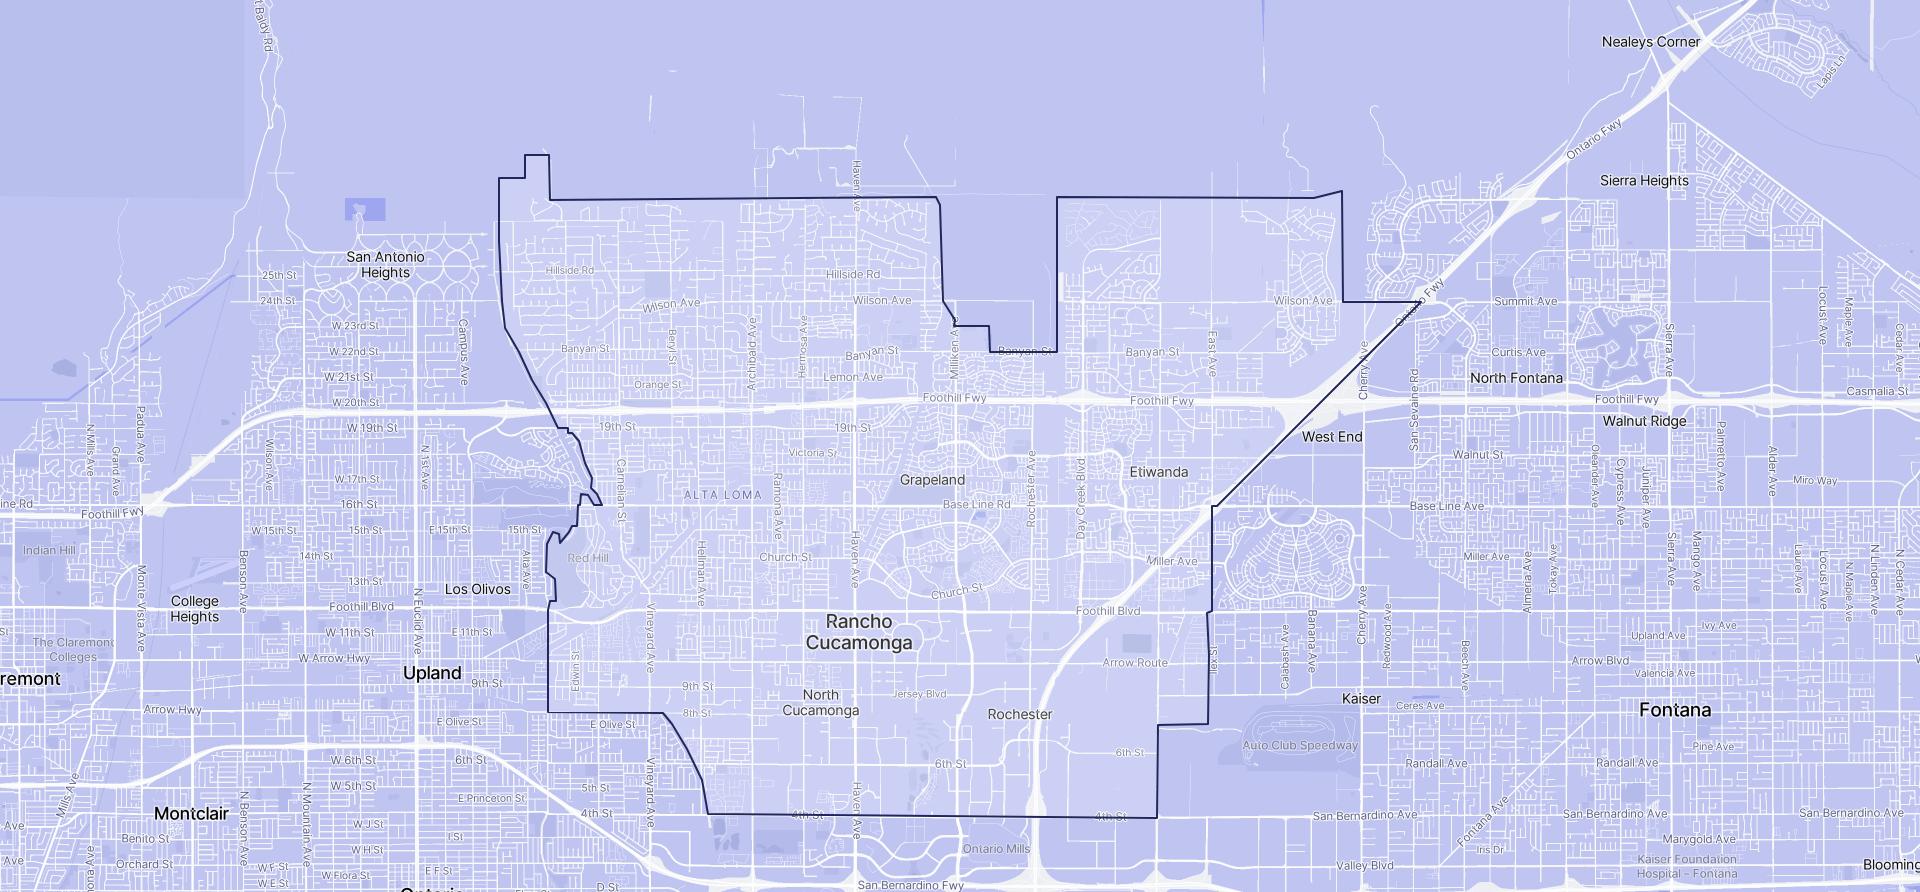 Image of Rancho Cucamonga boundaries on a map.